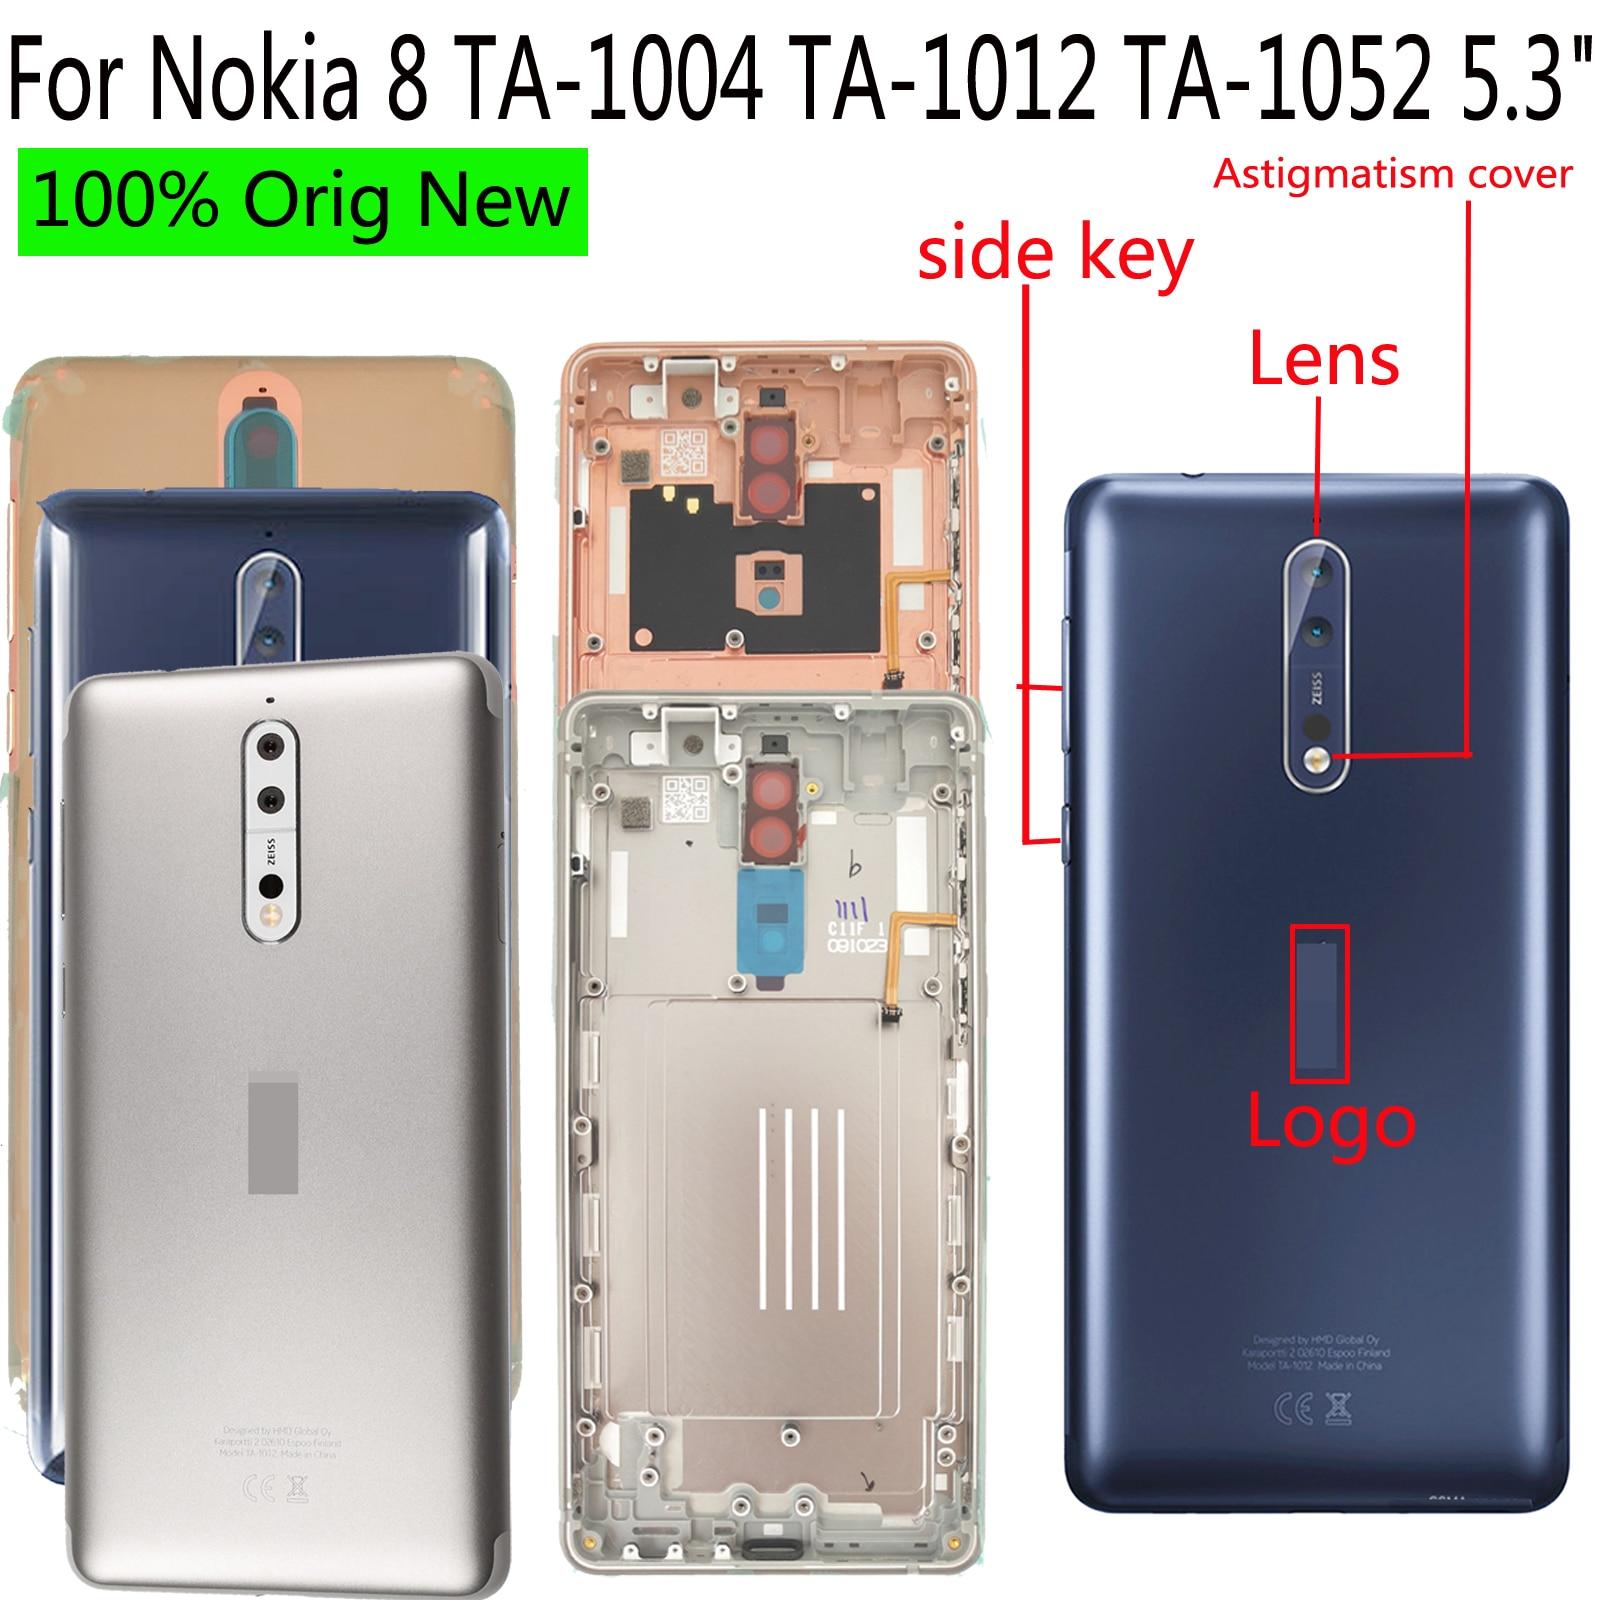 "Shyueda 100% Orig New + Lens 5.3"" For Nokia 8 TA-1004 TA-1012 TA-1052 Rear Back Door Housing Battery Door Cover(China)"